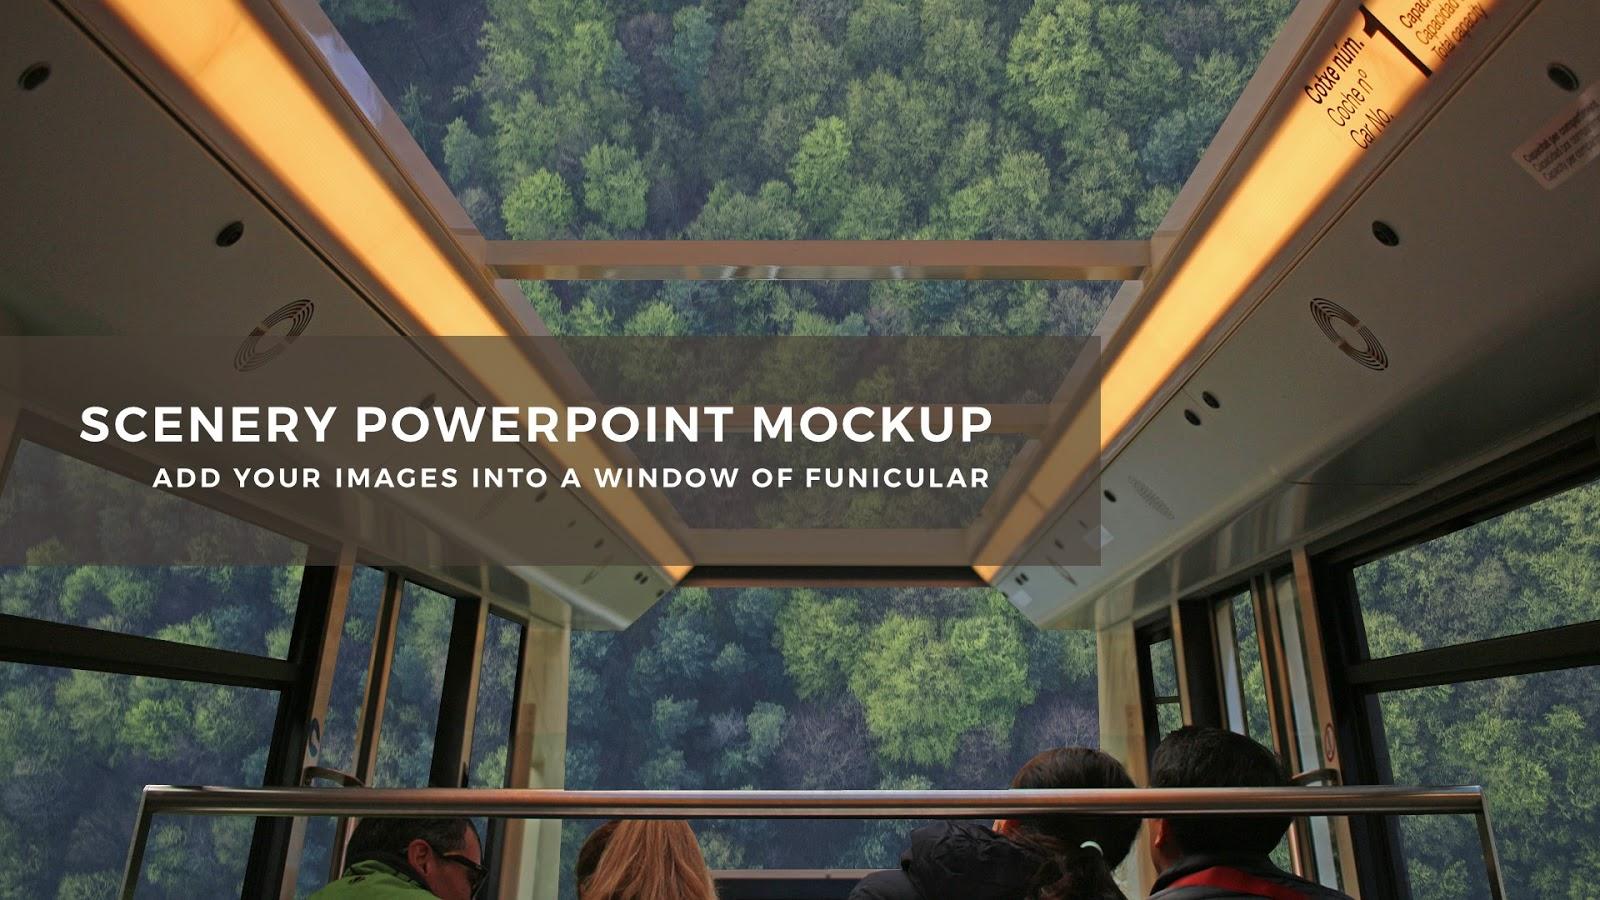 scenery powerpoint mockup template